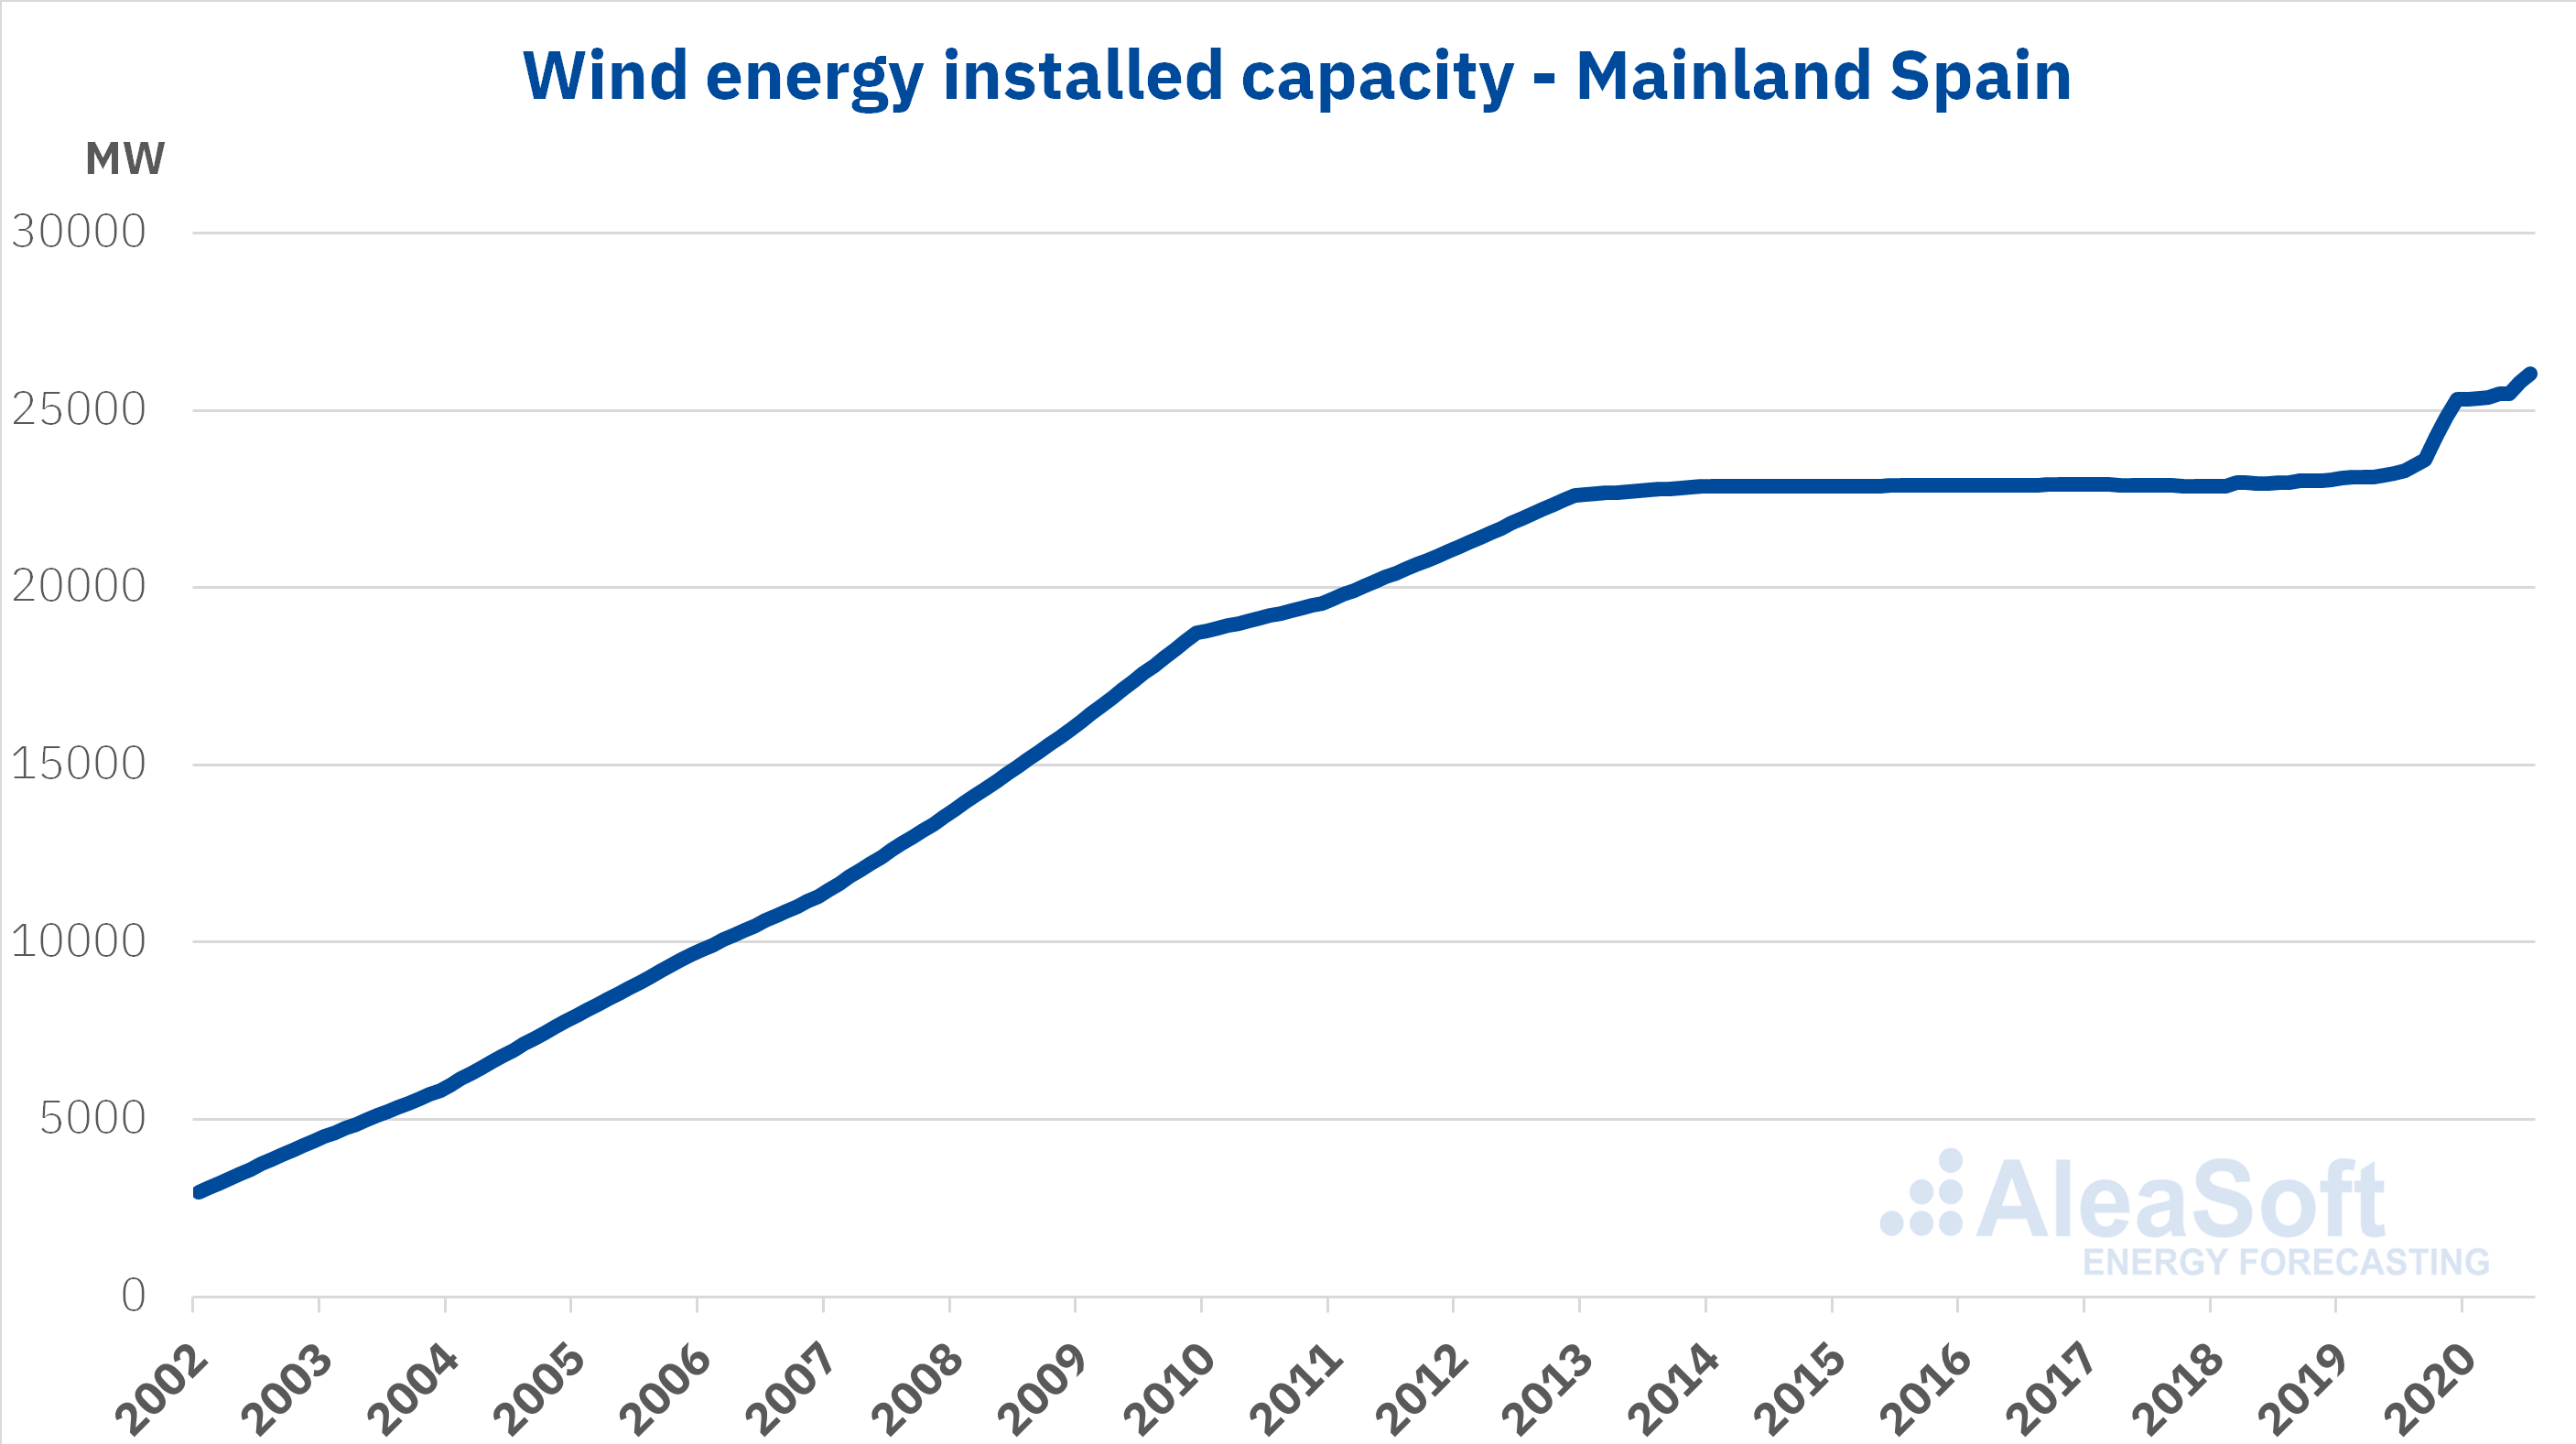 AleaSoft - Wind energy installed capacity Spain